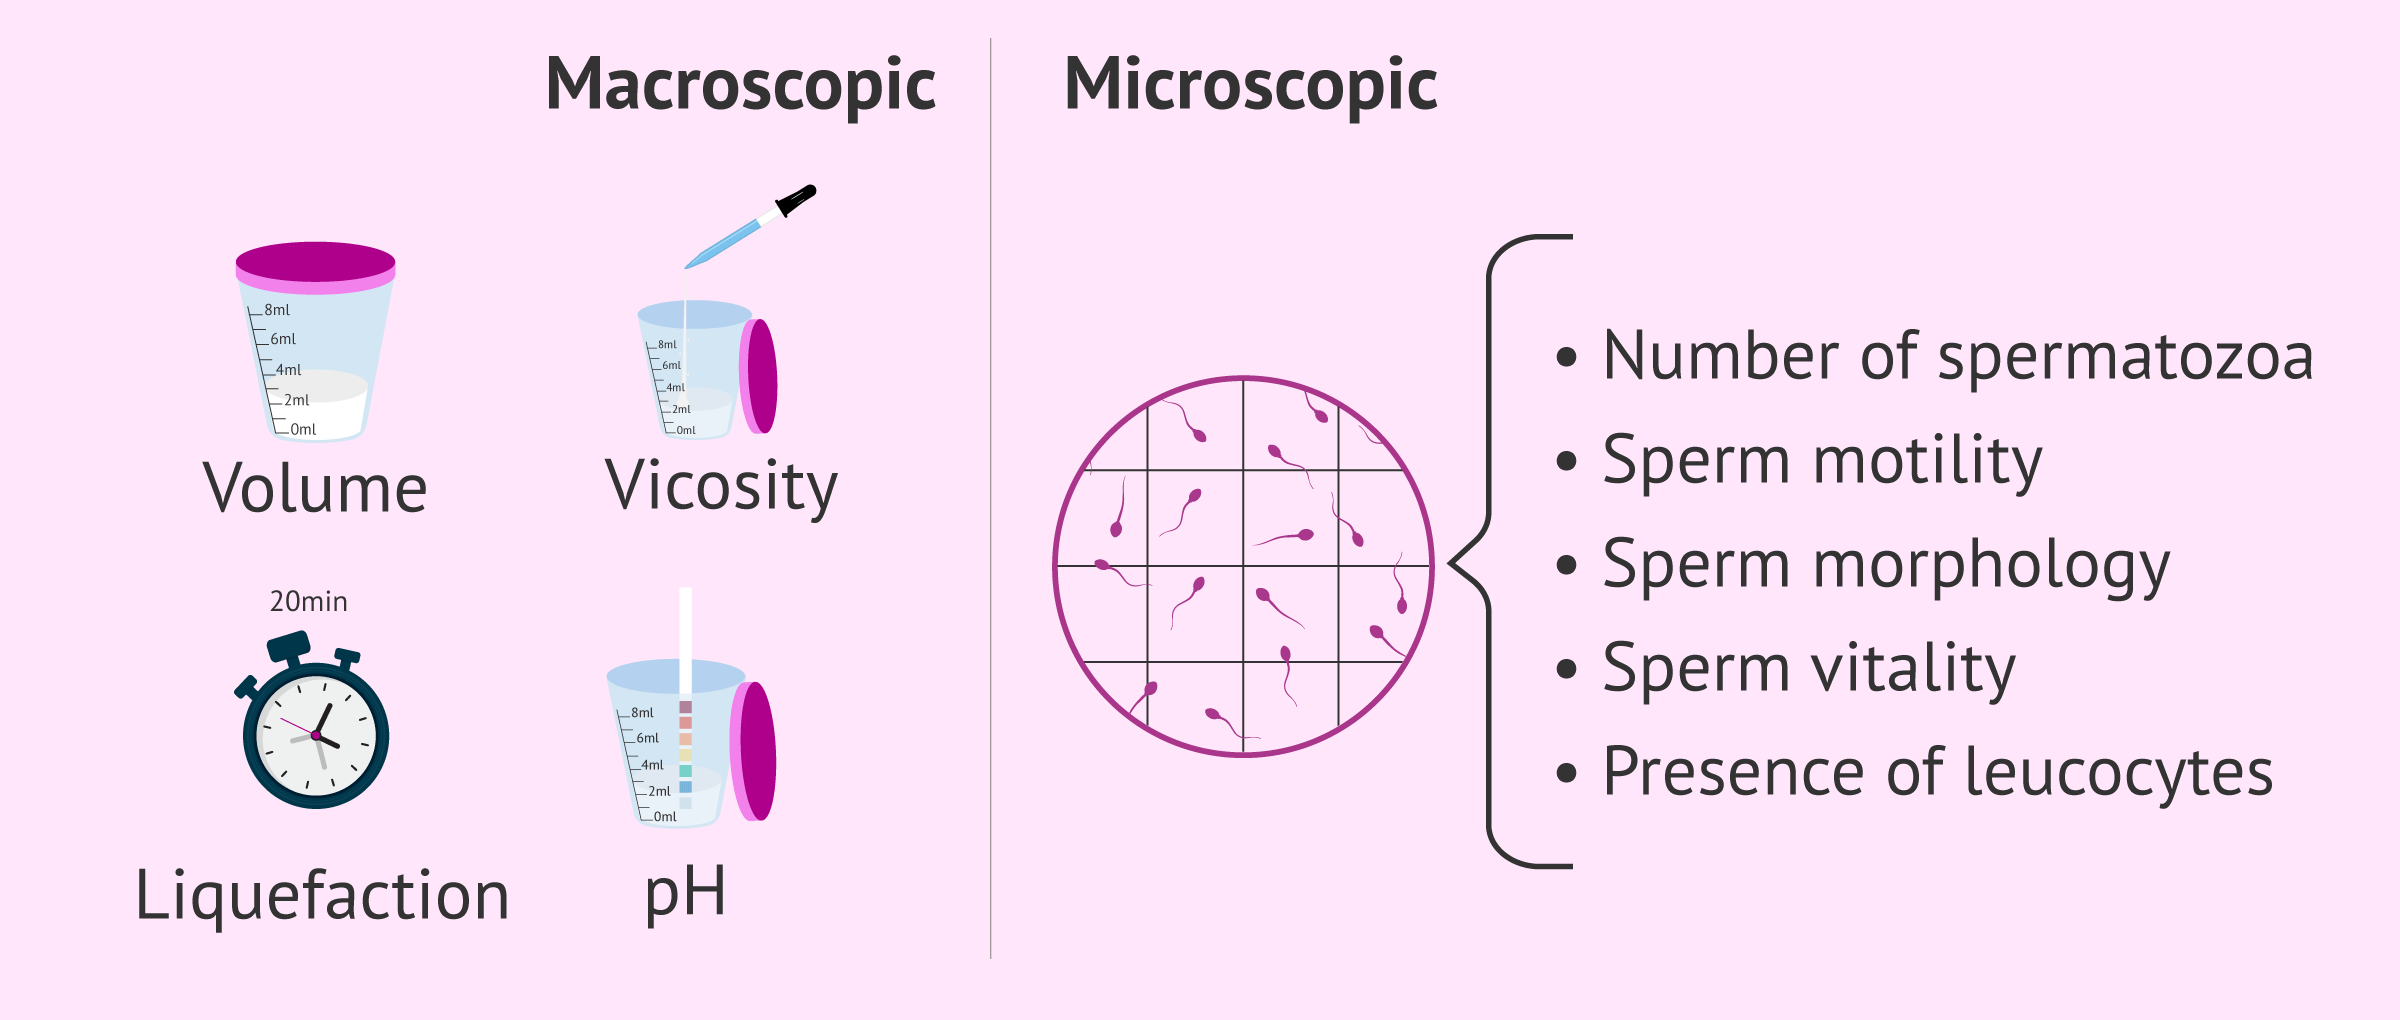 Basic semenogram with macroscopic and microscopic parameters